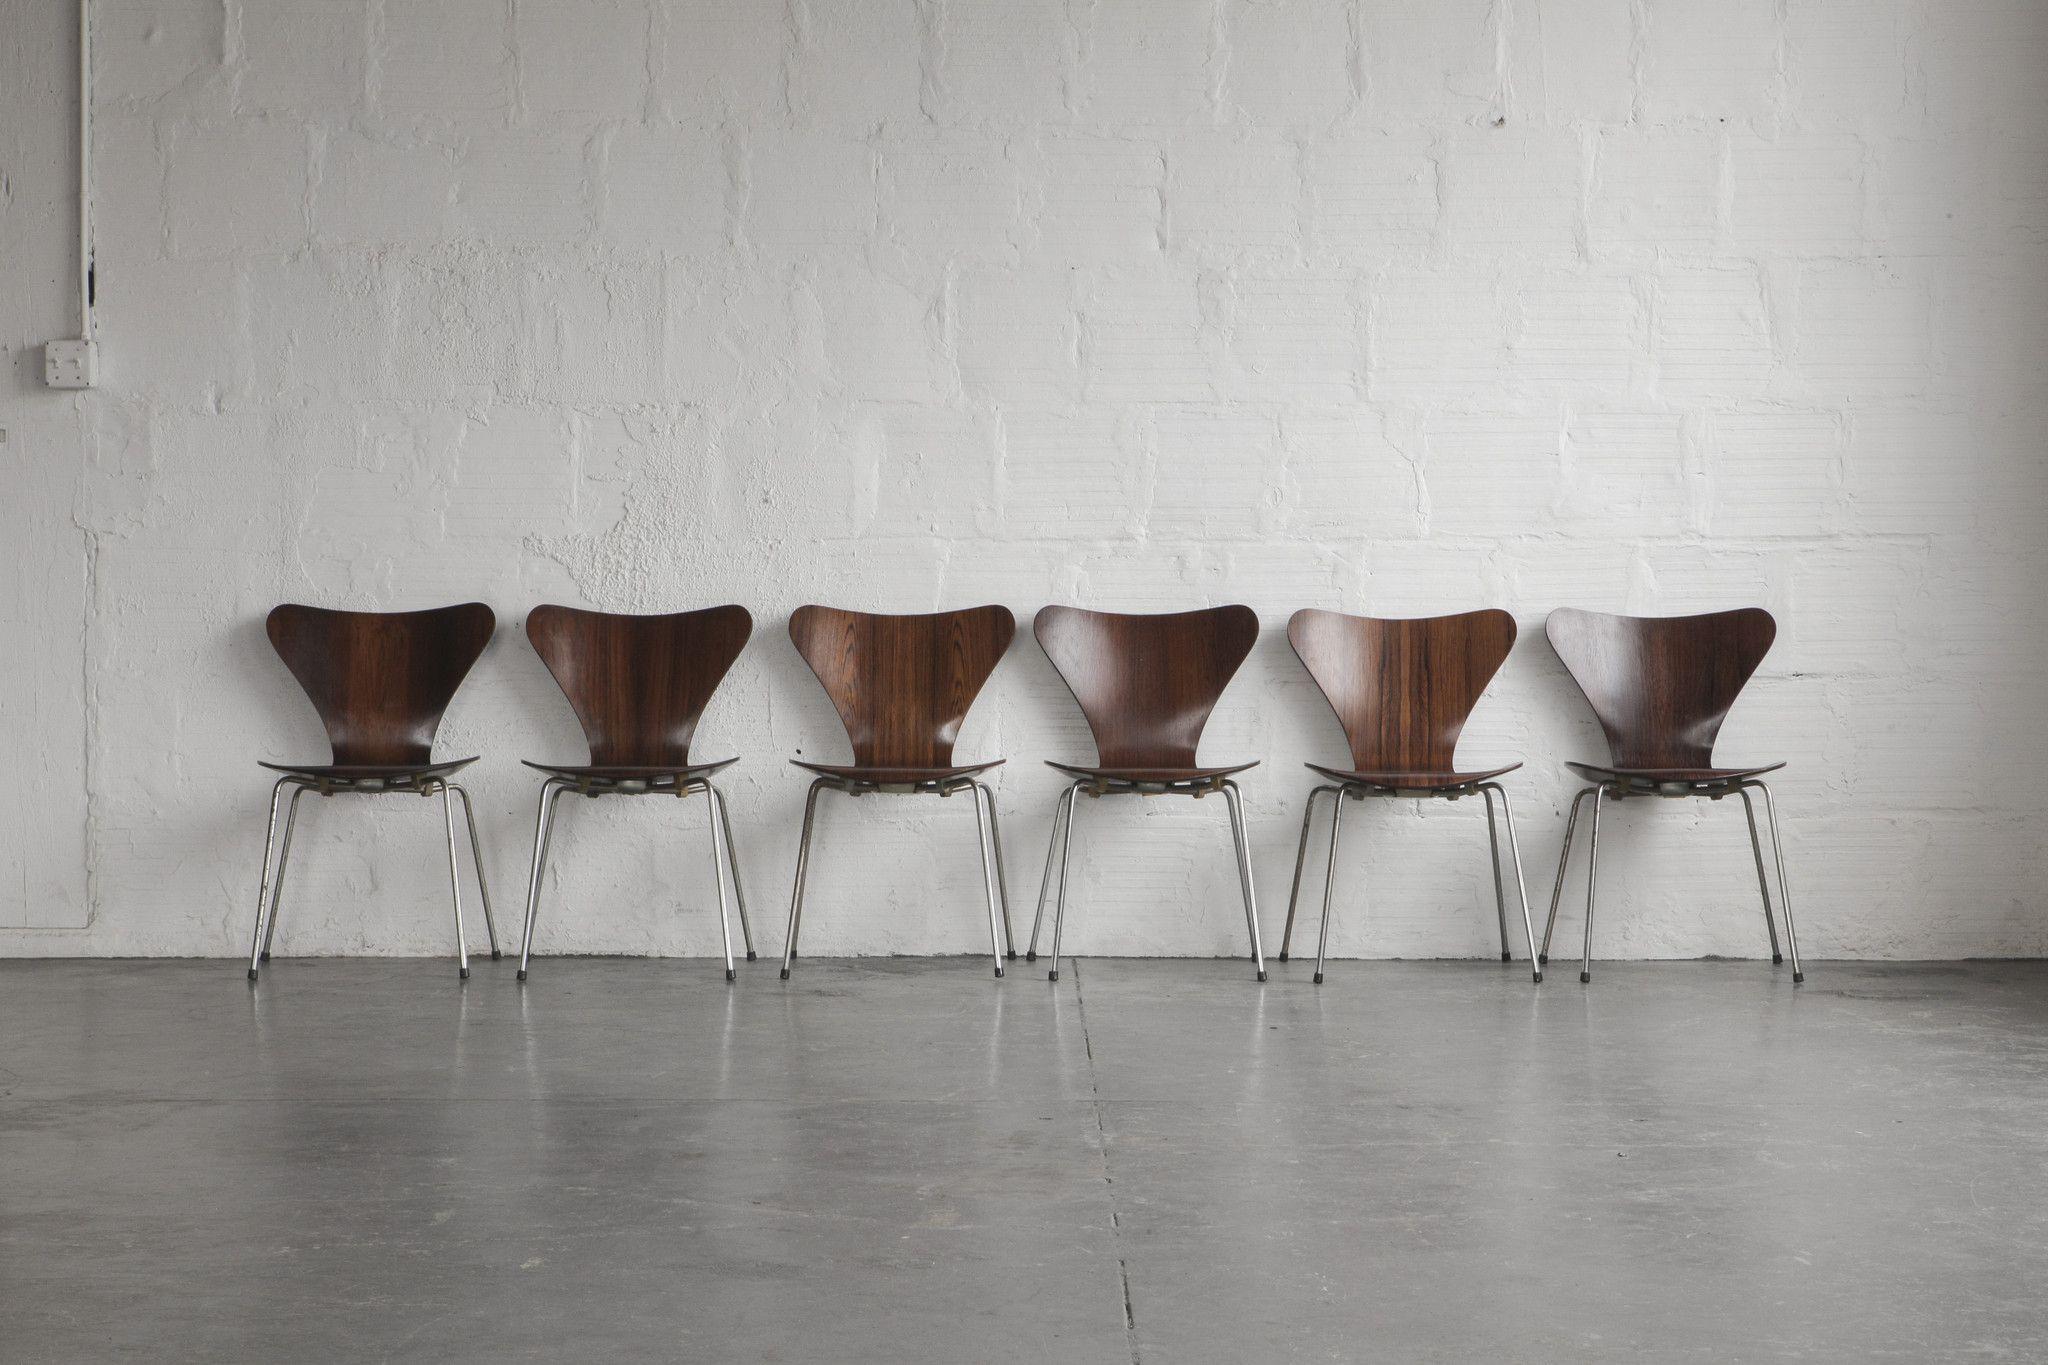 Arne Jacobsen Series 7 Dining Chairs Furniture Pinterest